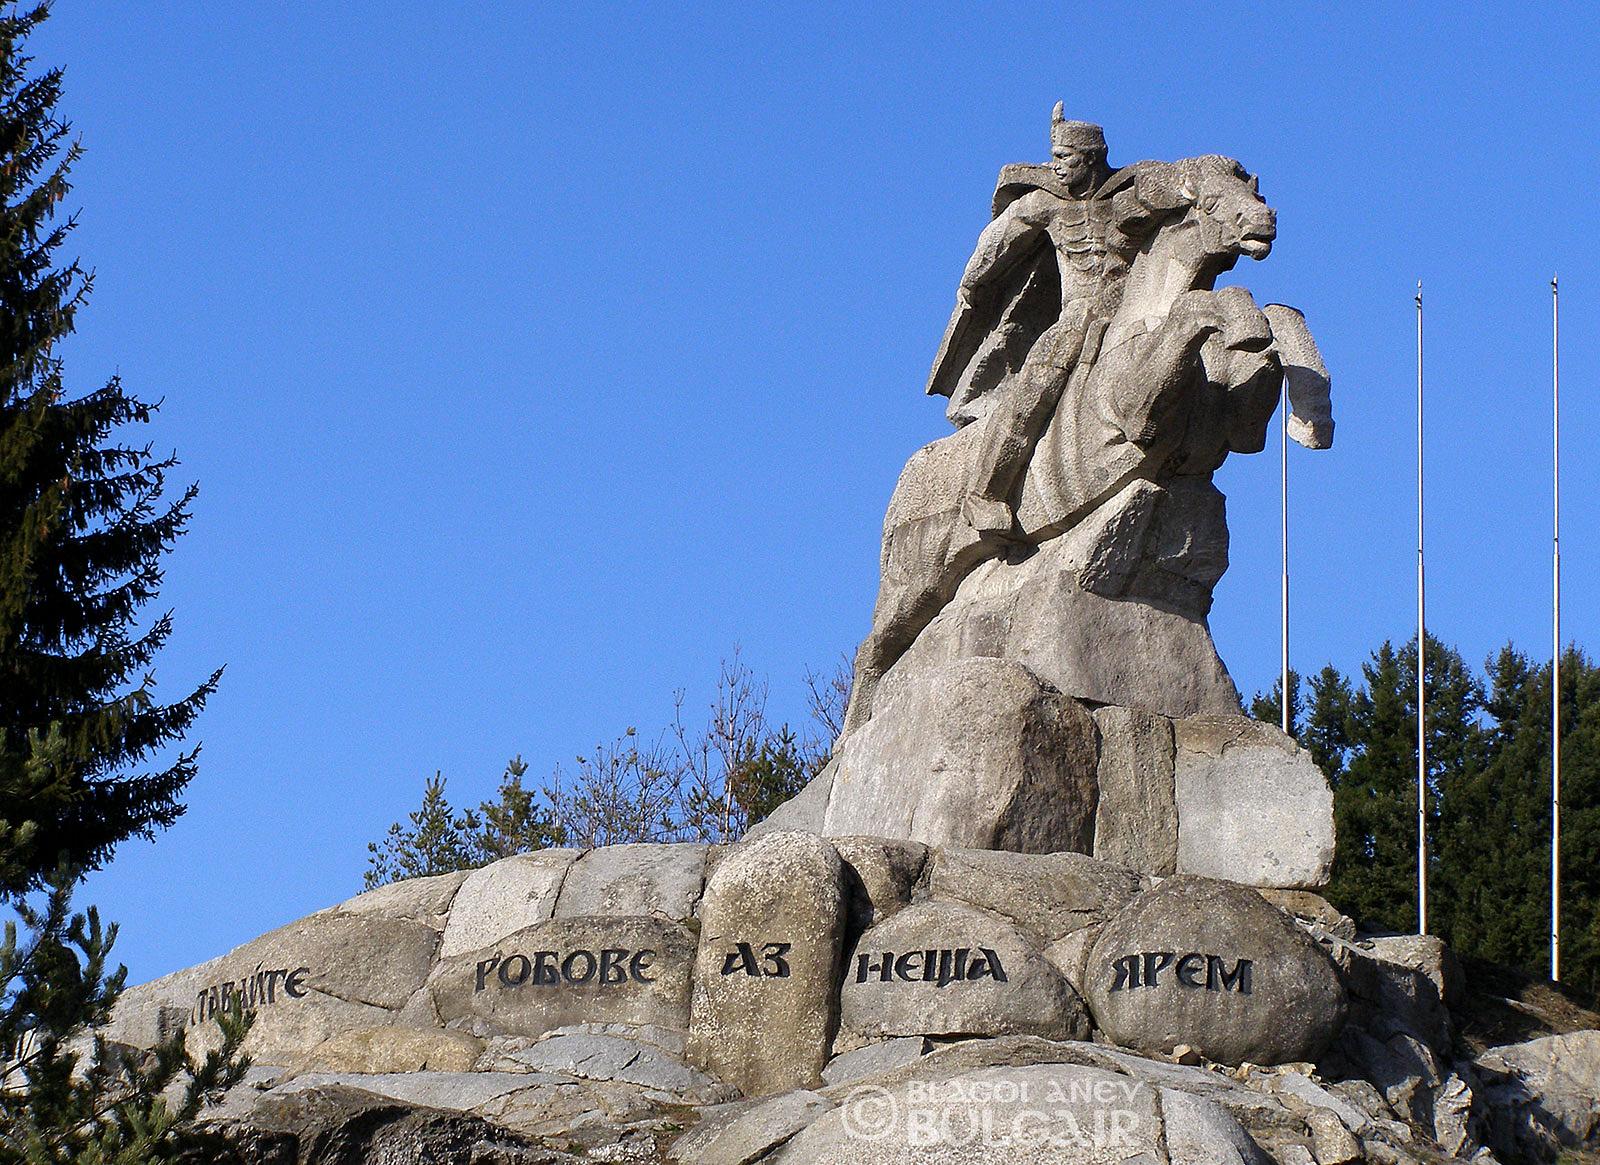 http://image.nauka.bg/kul/pametnici/Benkovski/Benkovski5.jpg